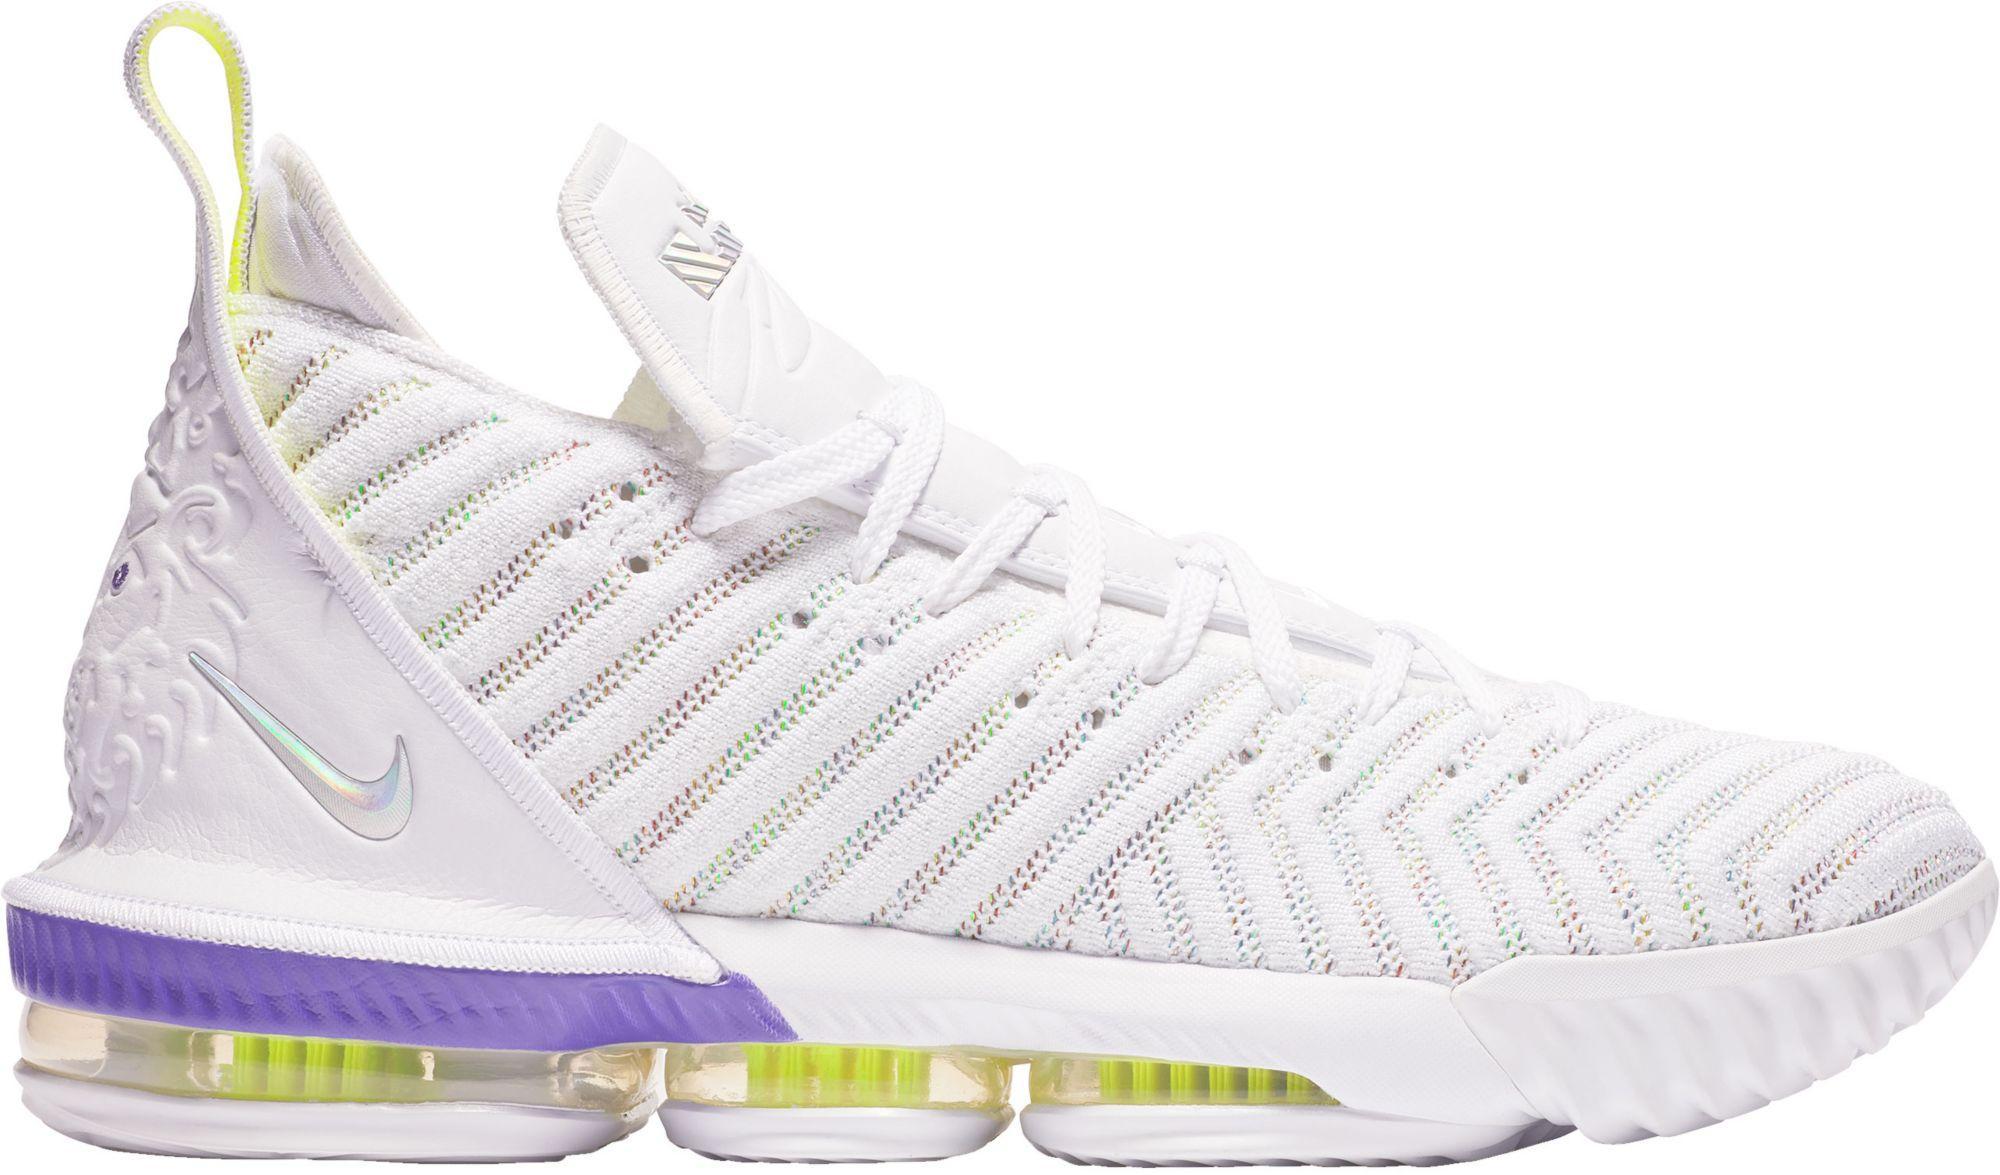 Nike Lebron 16 Basketball Shoes in